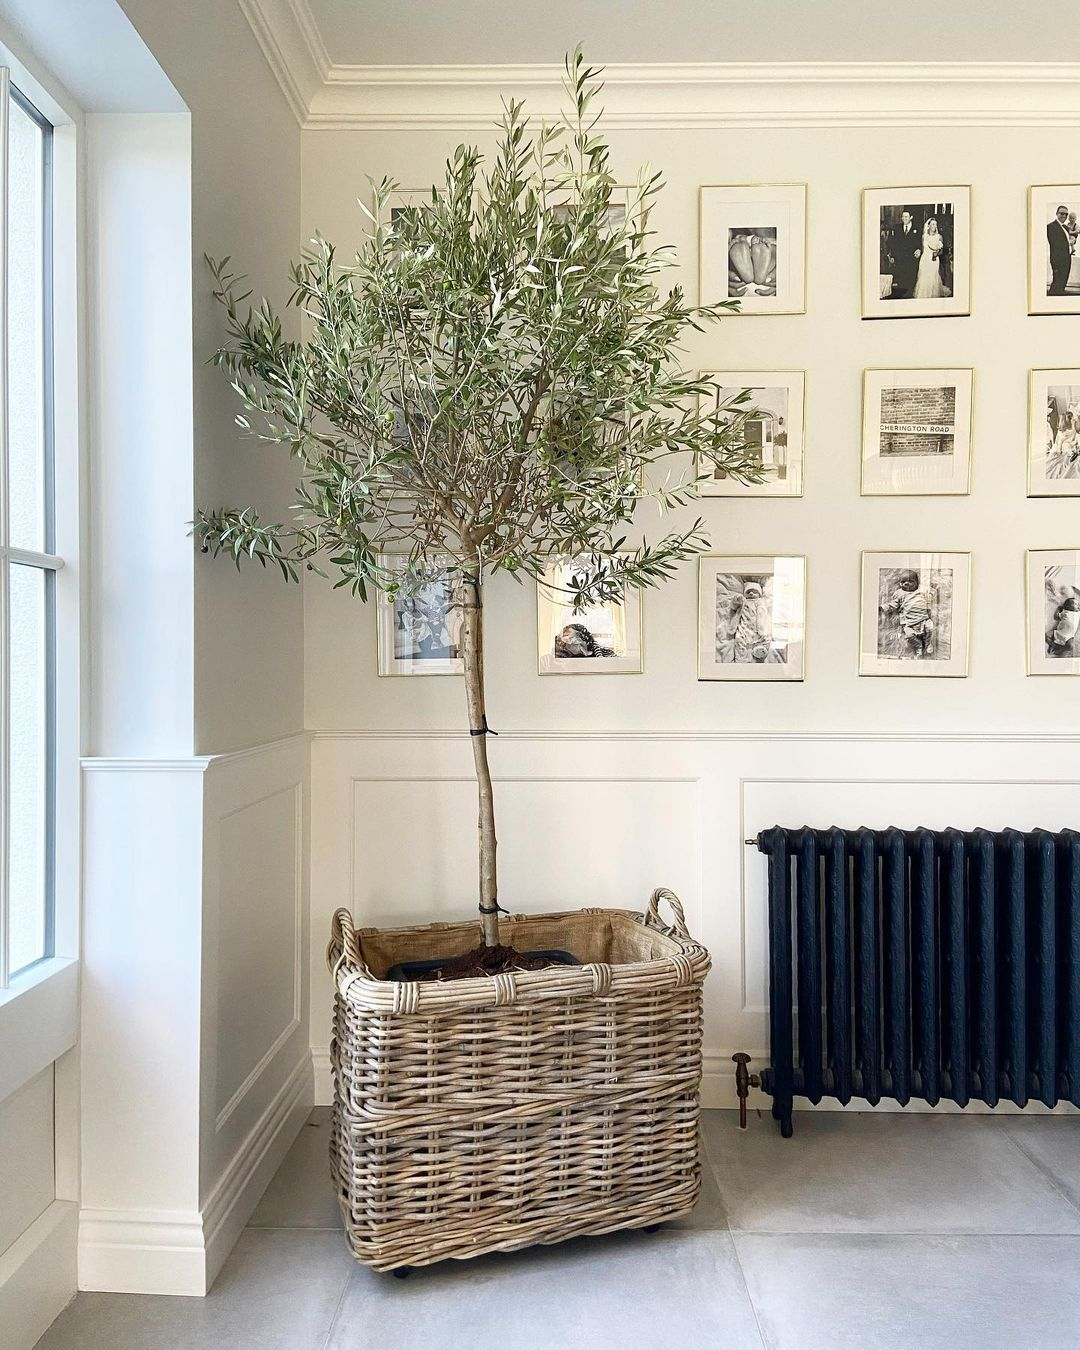 Watering An Indoor Olive Tree